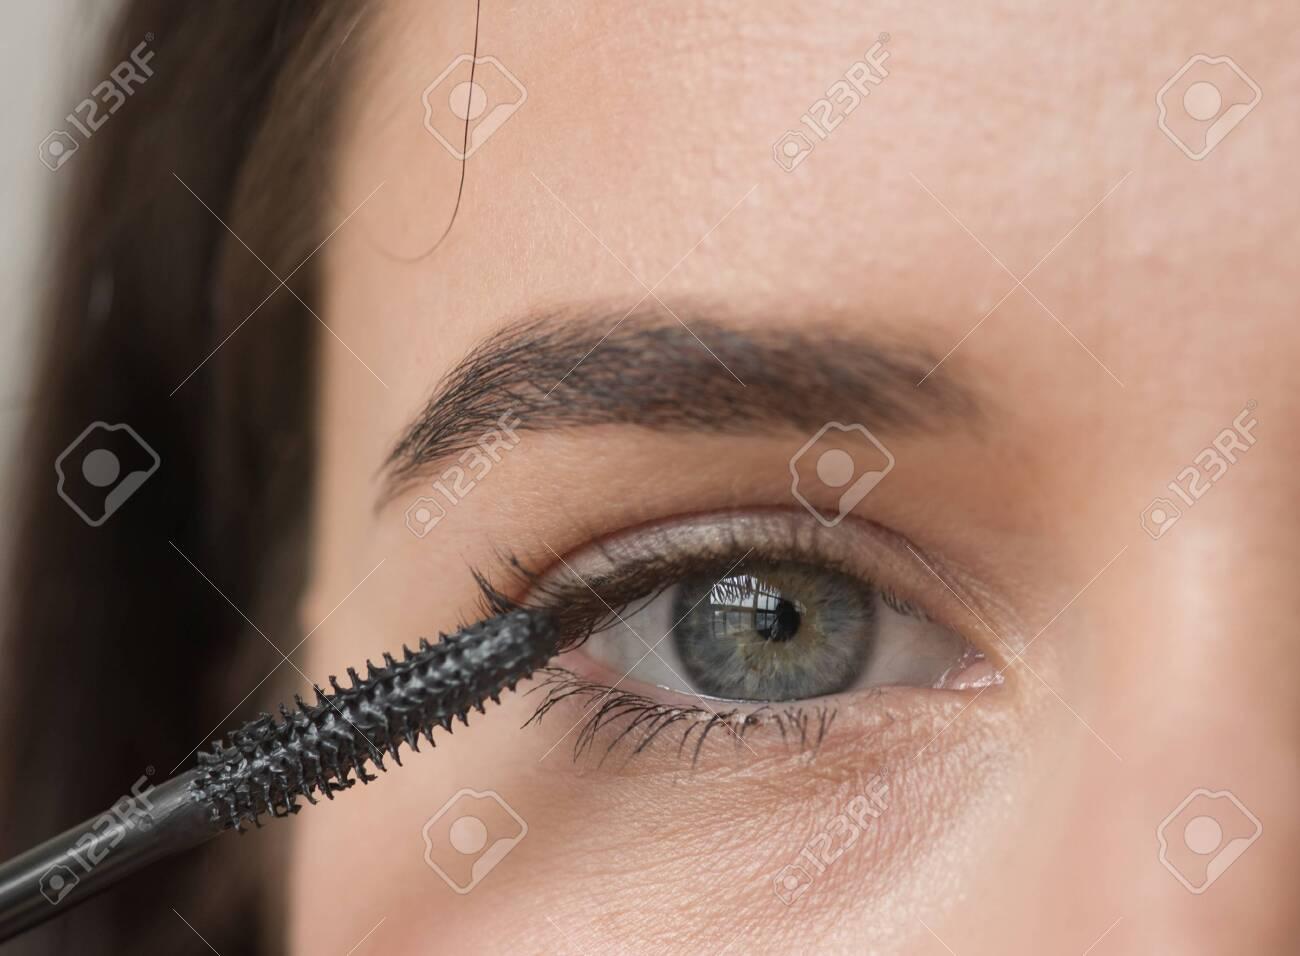 Woman makeup mascara eyes healthy skin natural fashion makeup. Studio shot. - 143599101